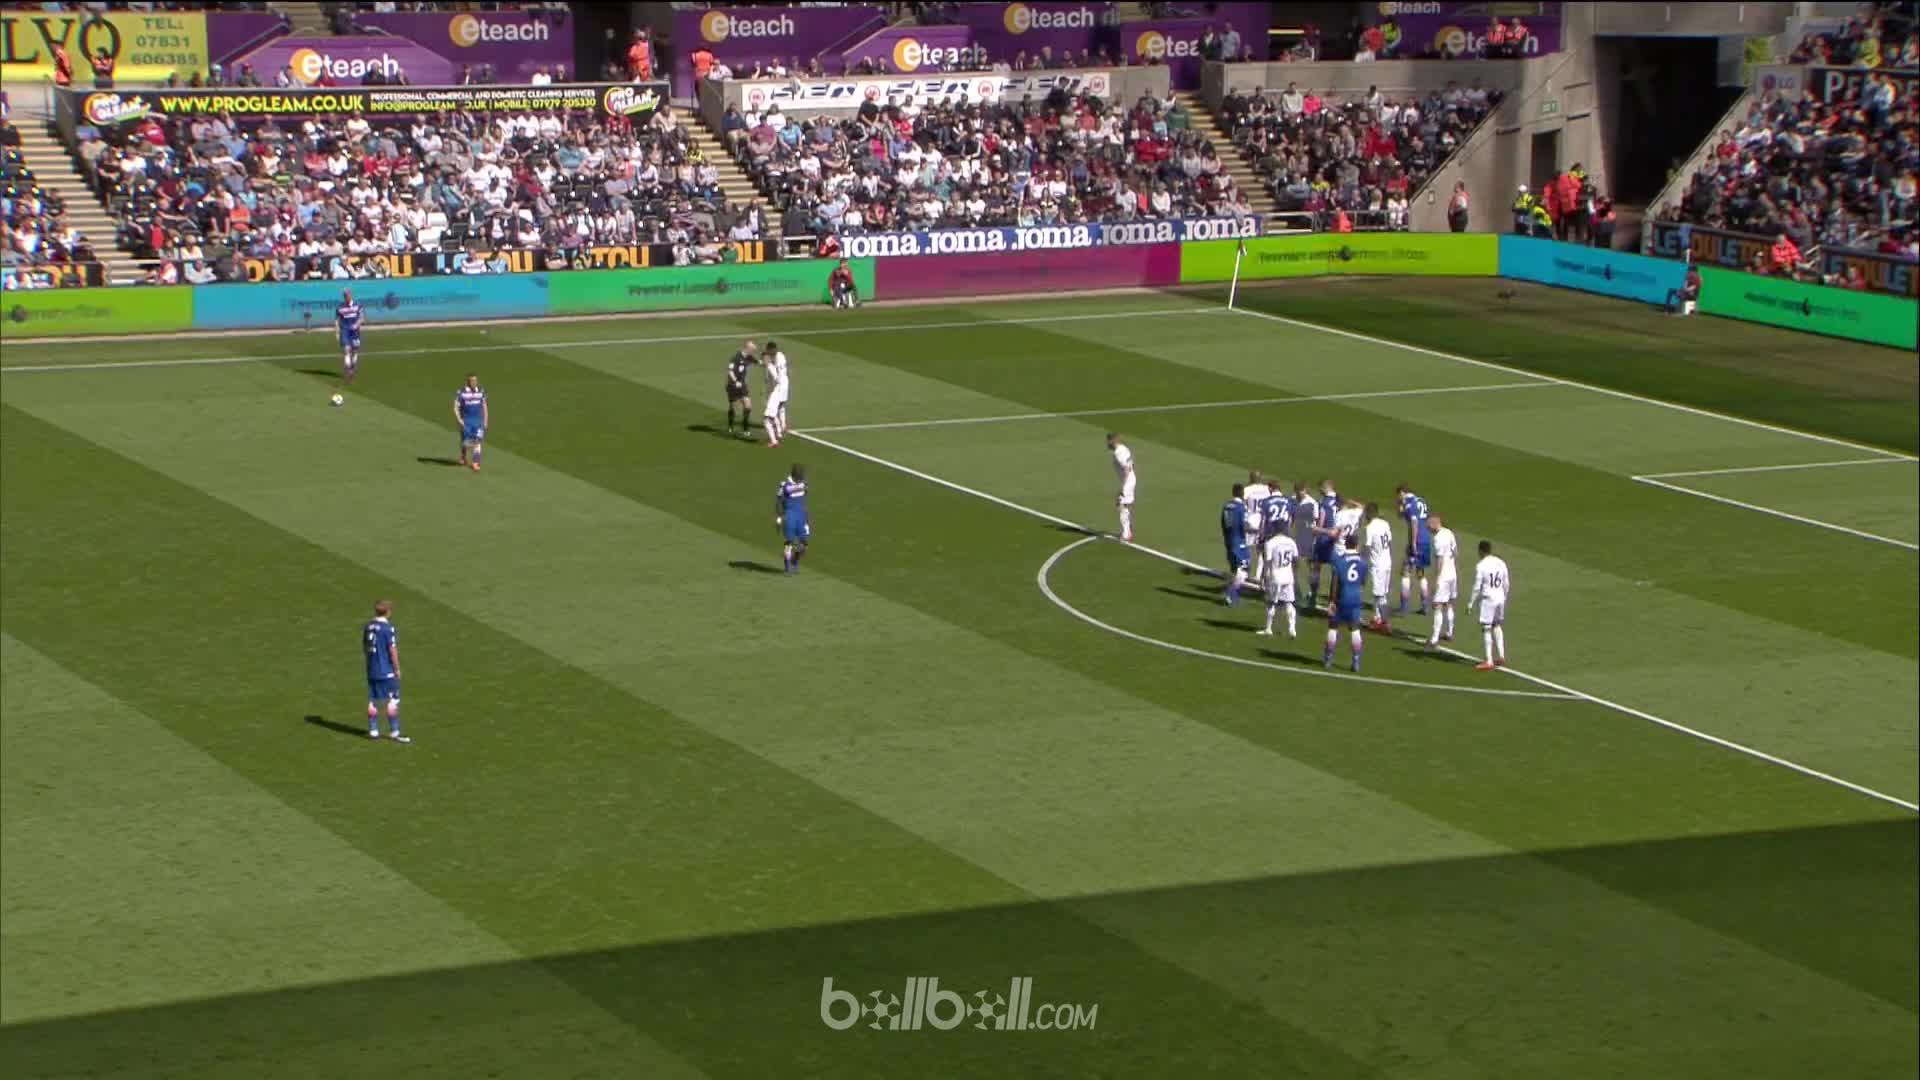 Goal P Crouch Swansea 1 - 2 Stoke